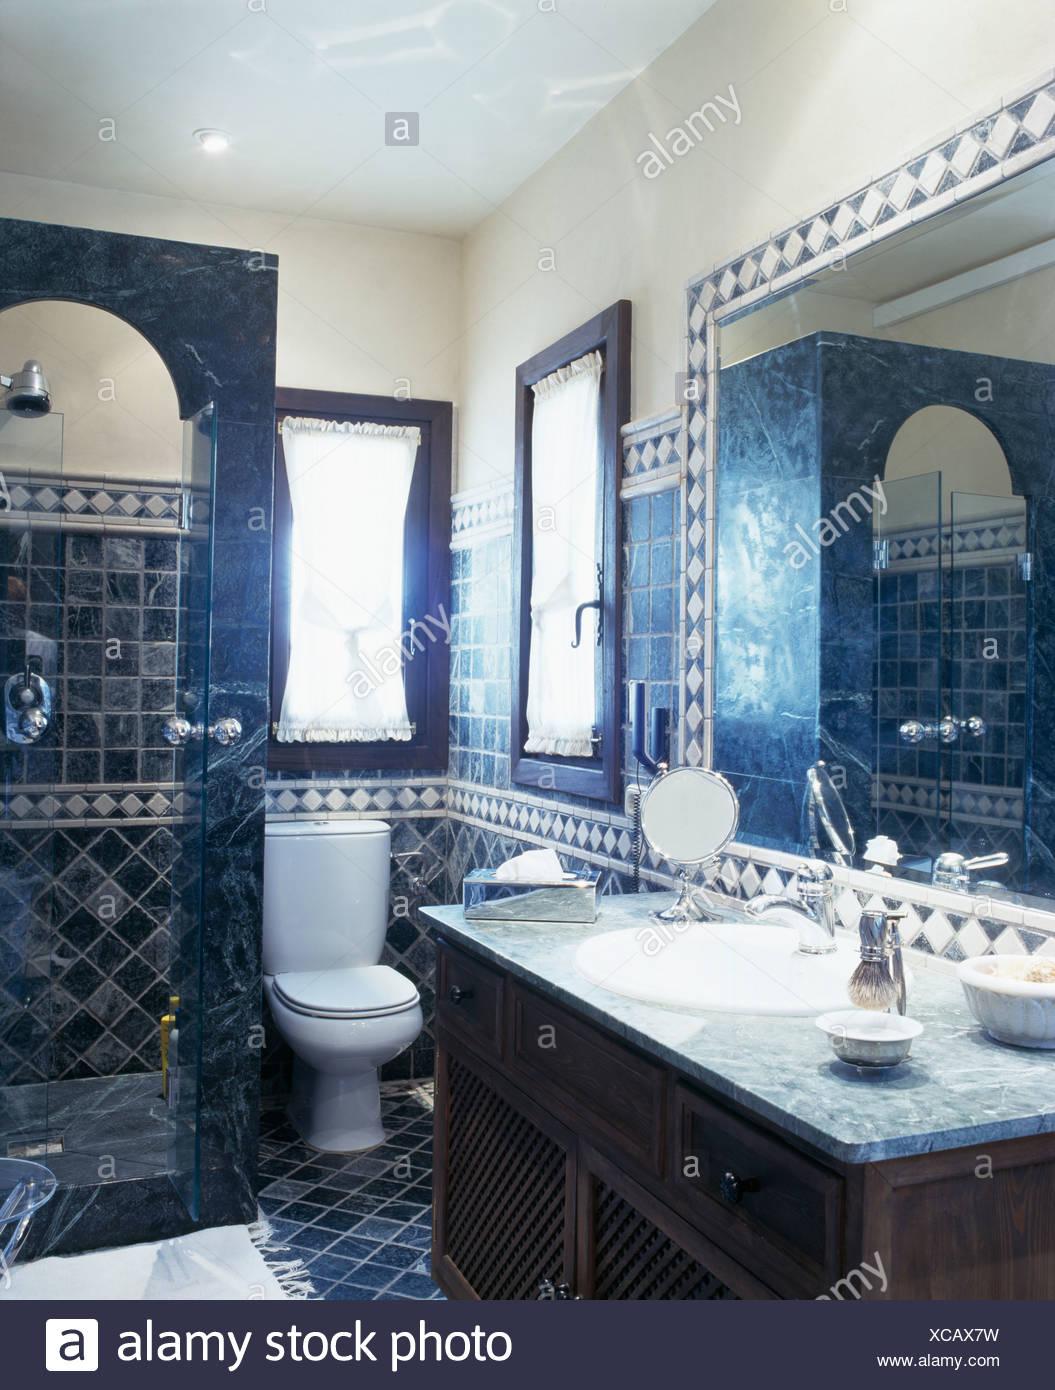 Traditional blue tiled Spanish bathroom Stock Photo: 282981885 - Alamy